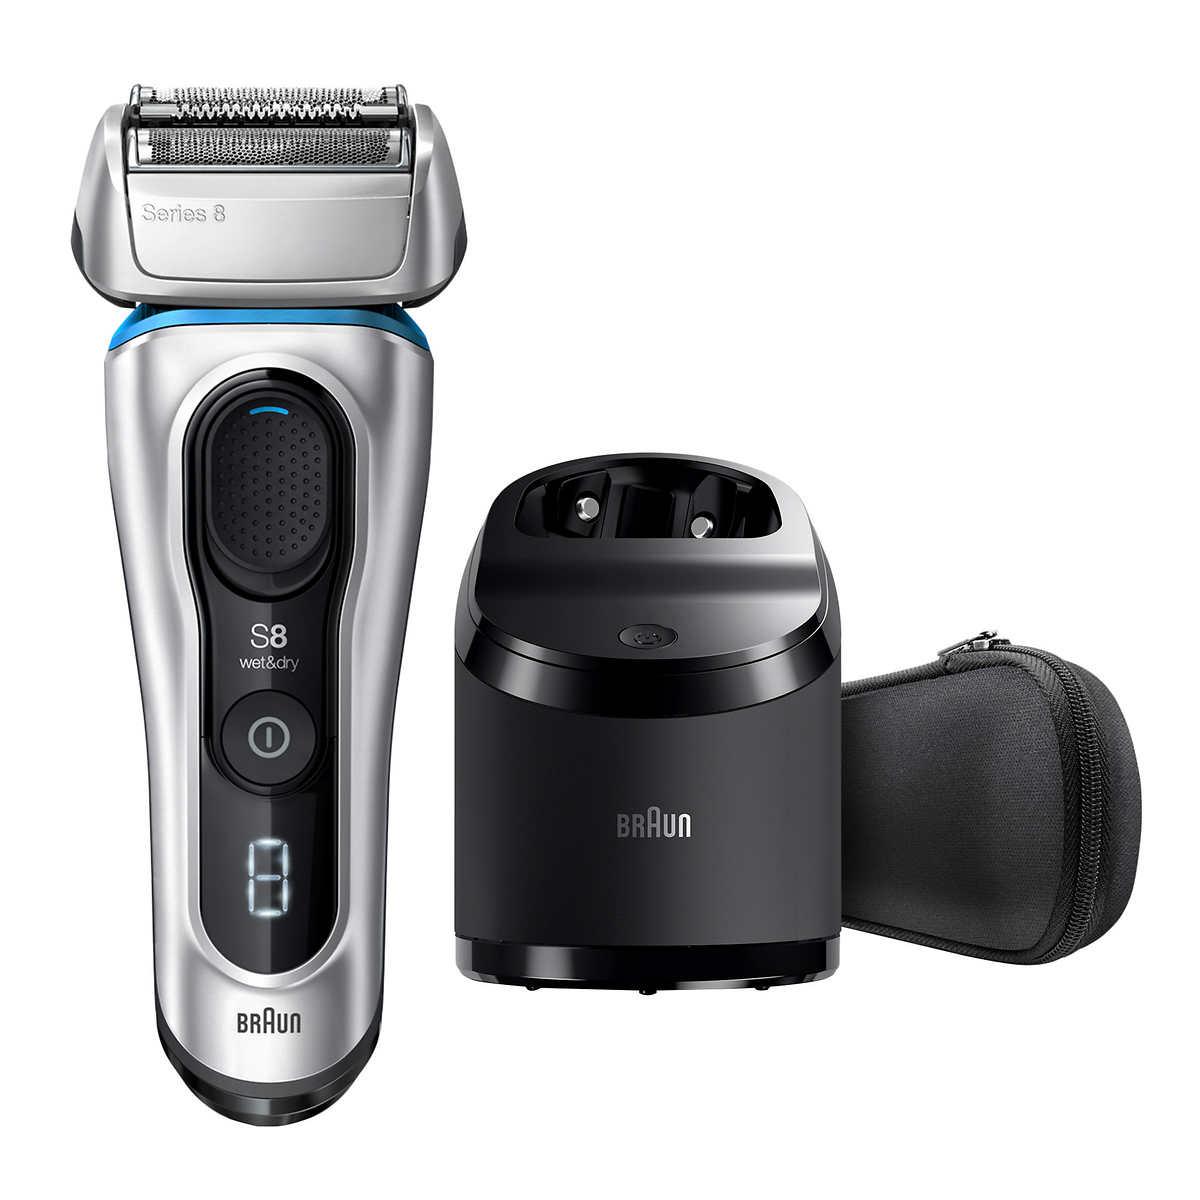 Costco members: Braun Series 8 Electric Shaver ($179.99-$50=) $129.99